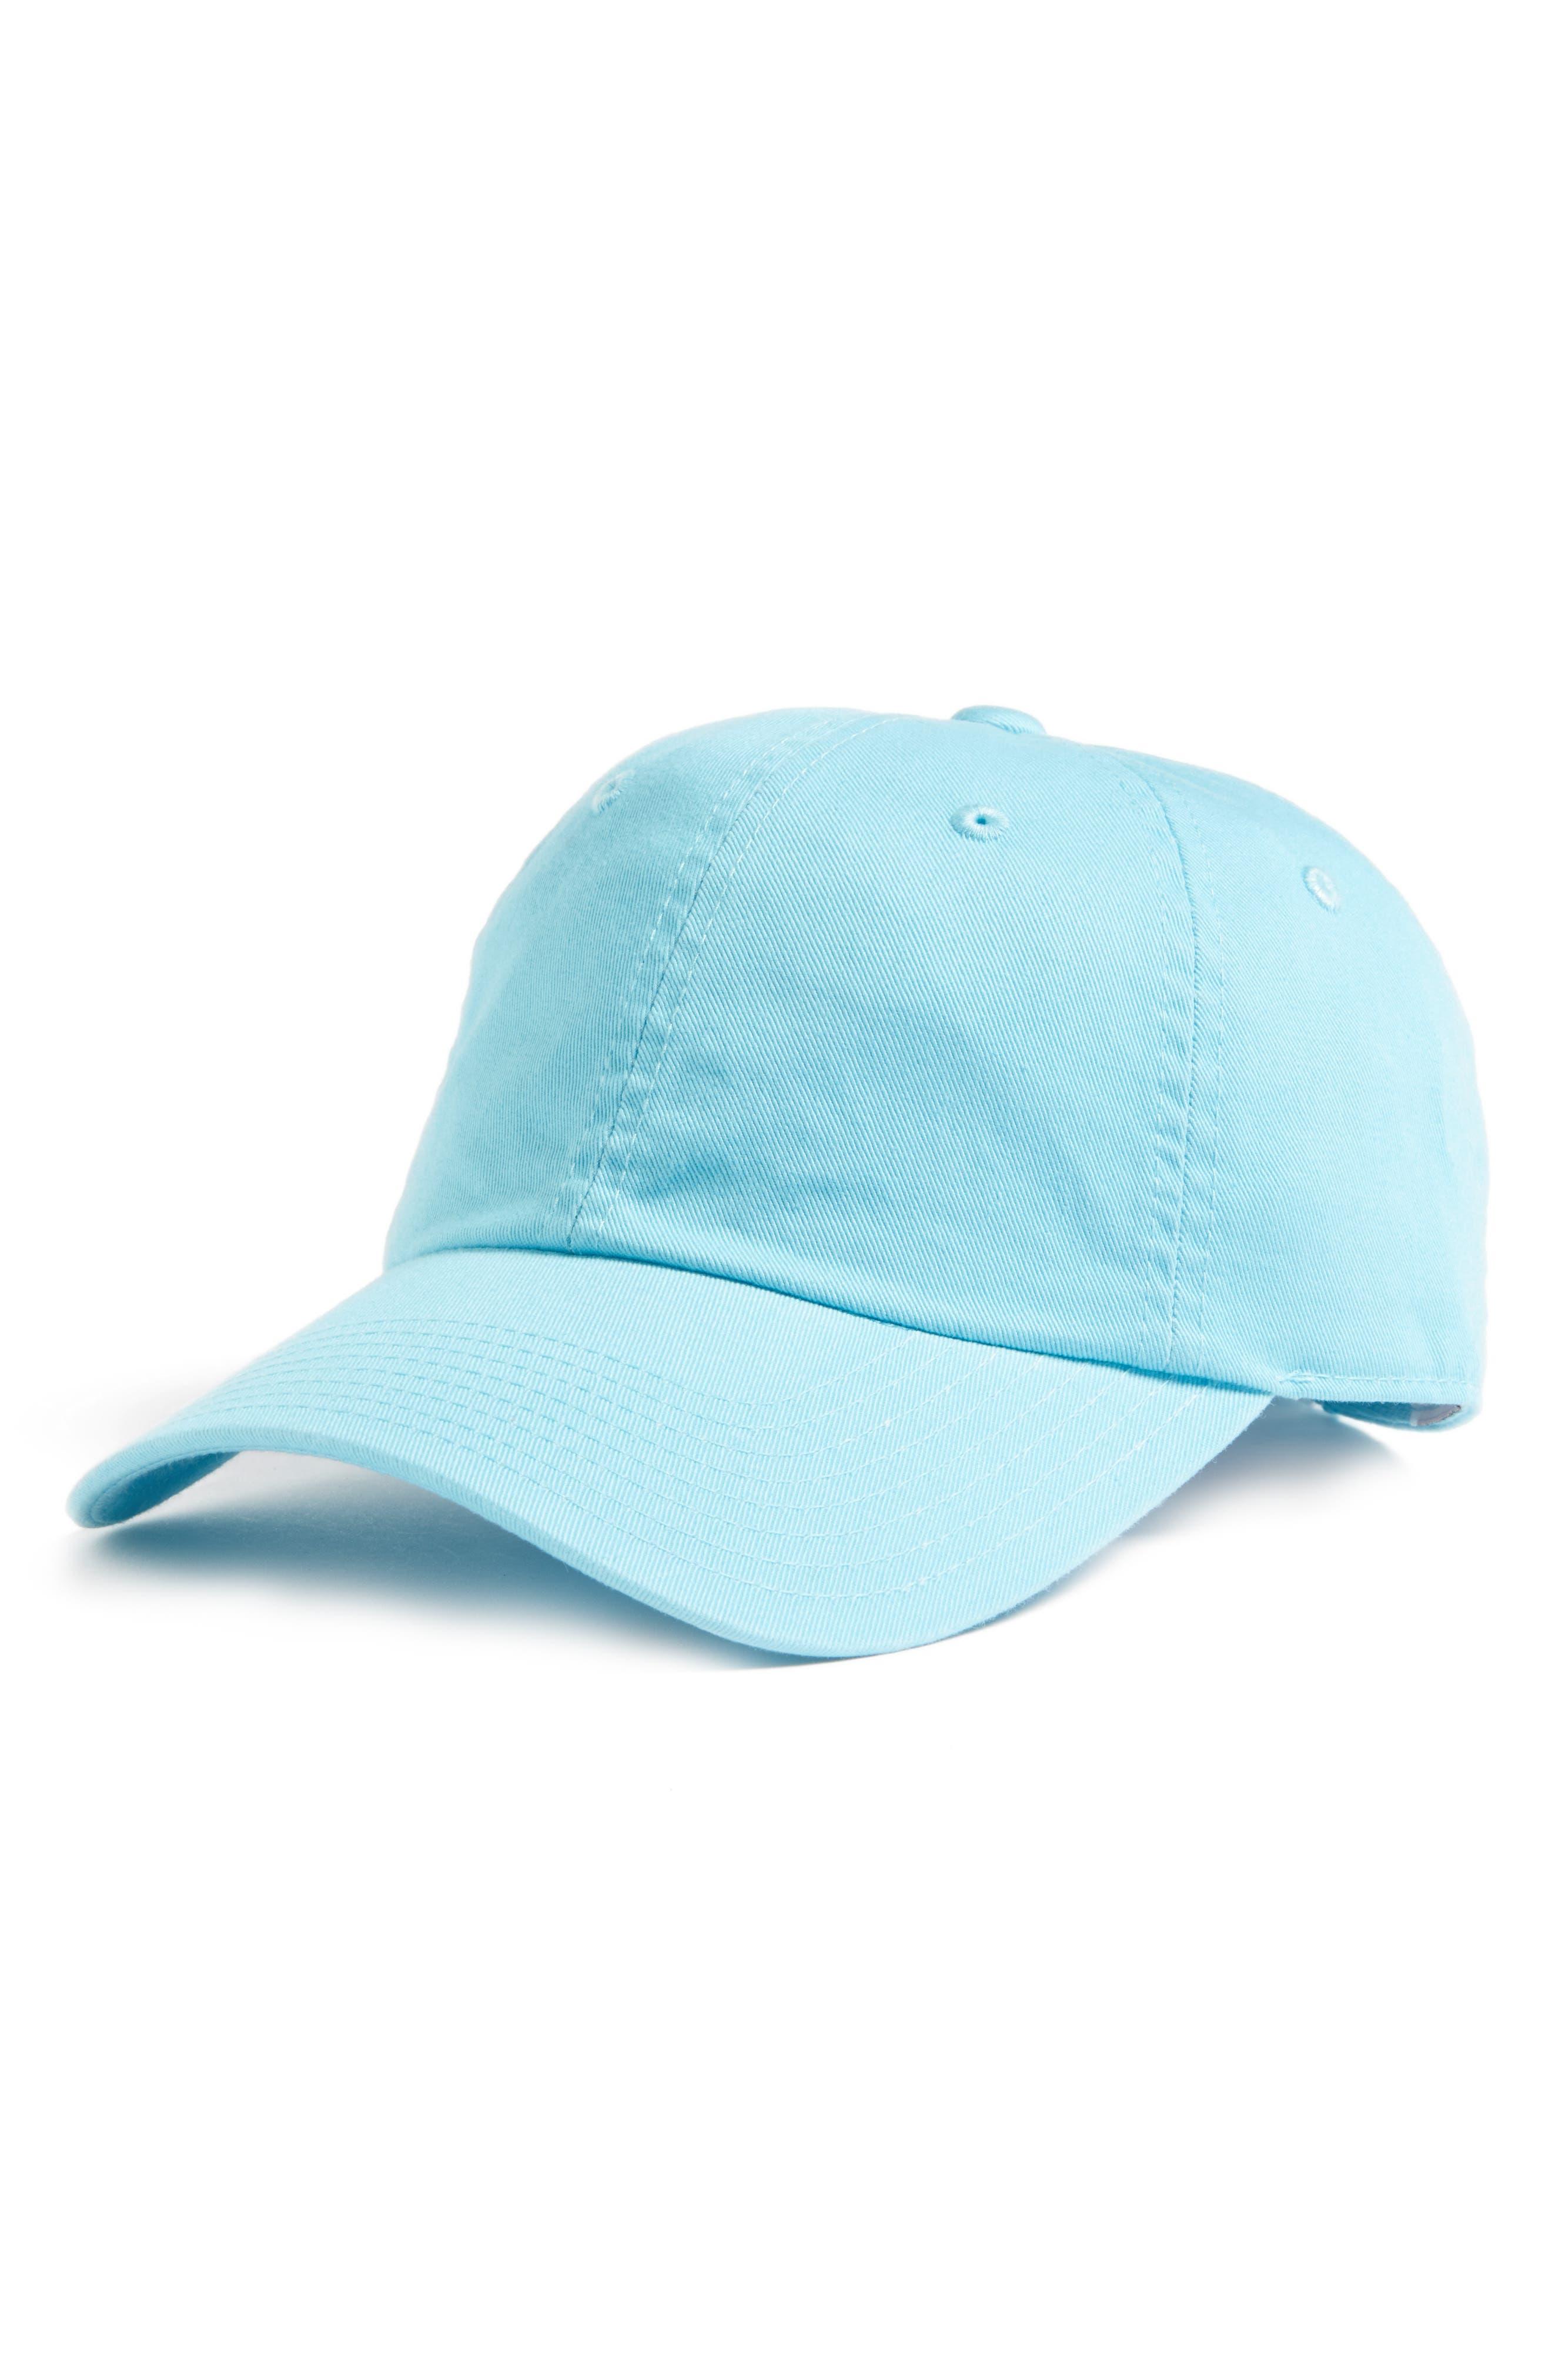 Washed Cotton Baseball Cap,                             Main thumbnail 1, color,                             Tropiques